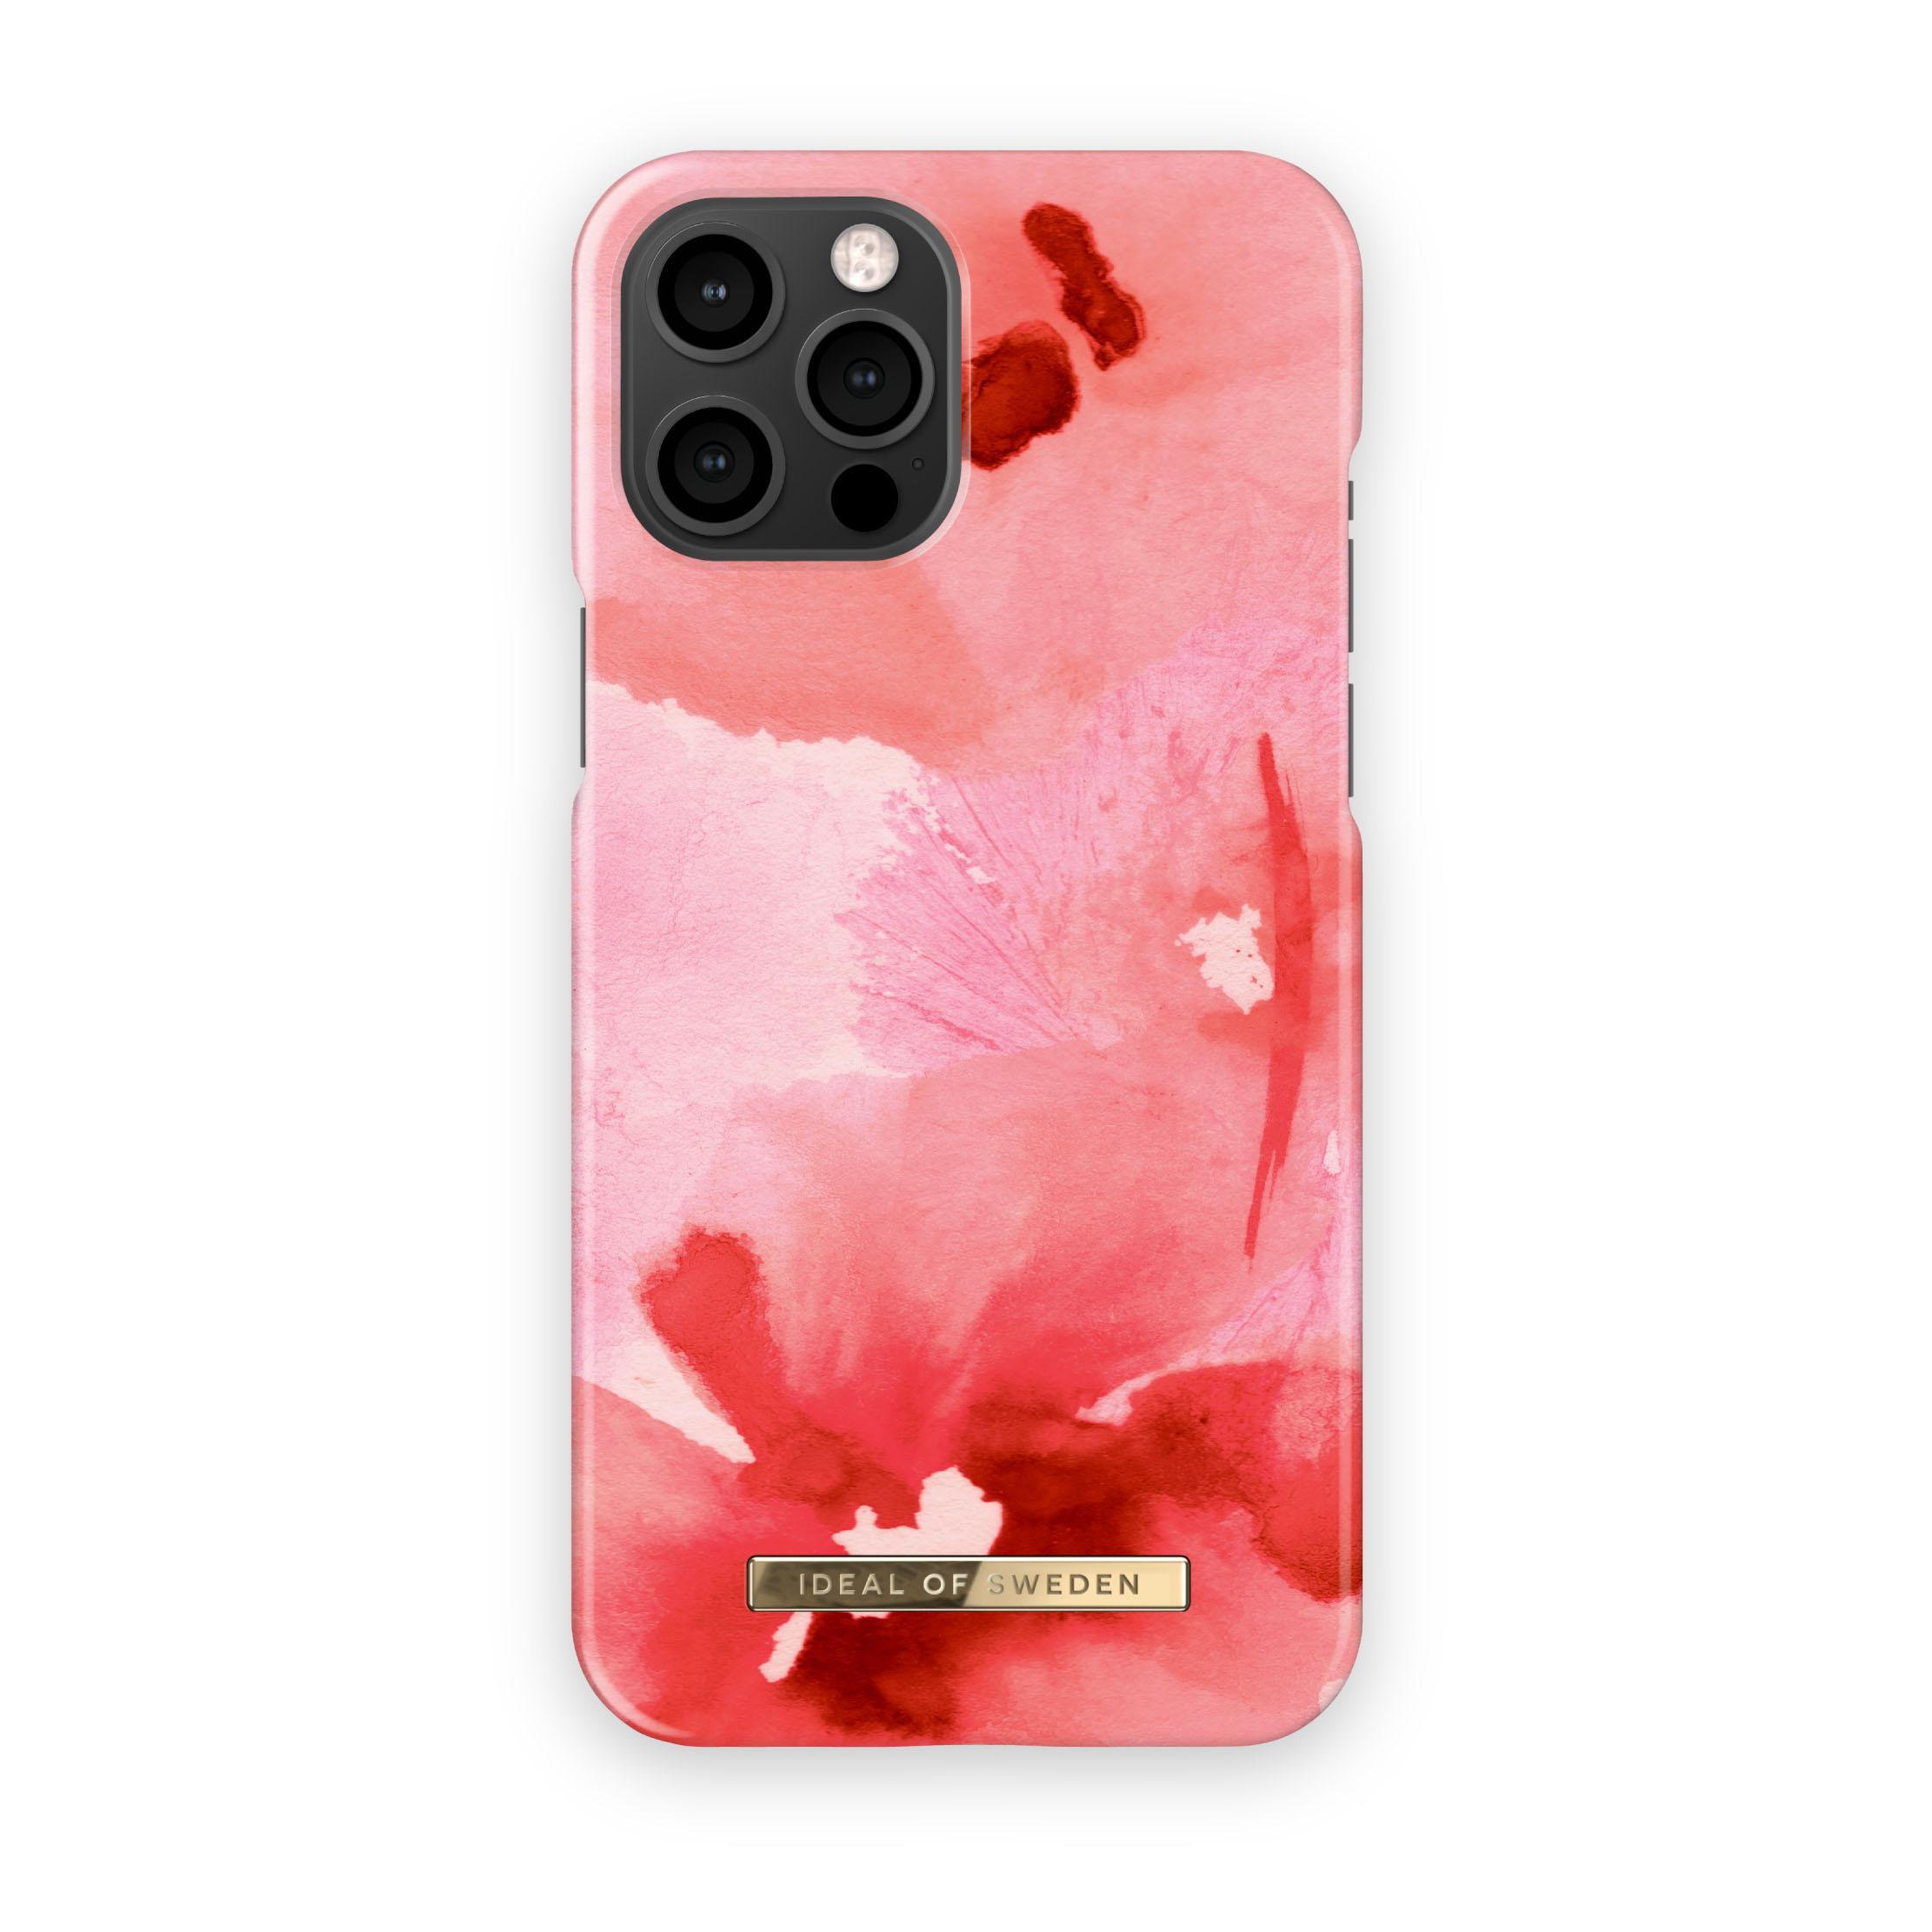 Fashion Case iPhone 12 Pro Max Coral Blush Floral